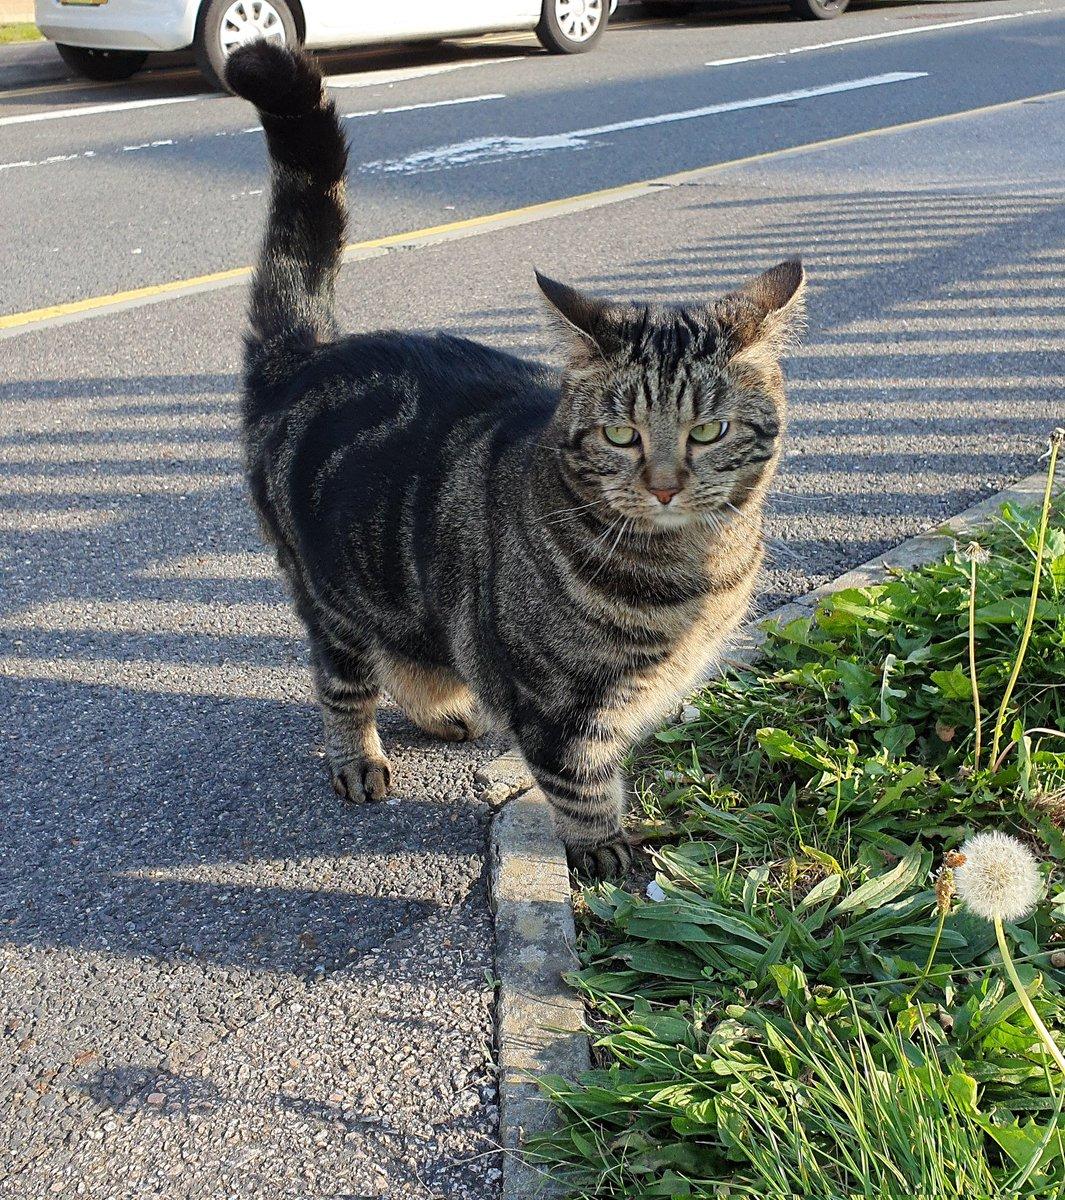 @LolaLegged's photo on #Caturday